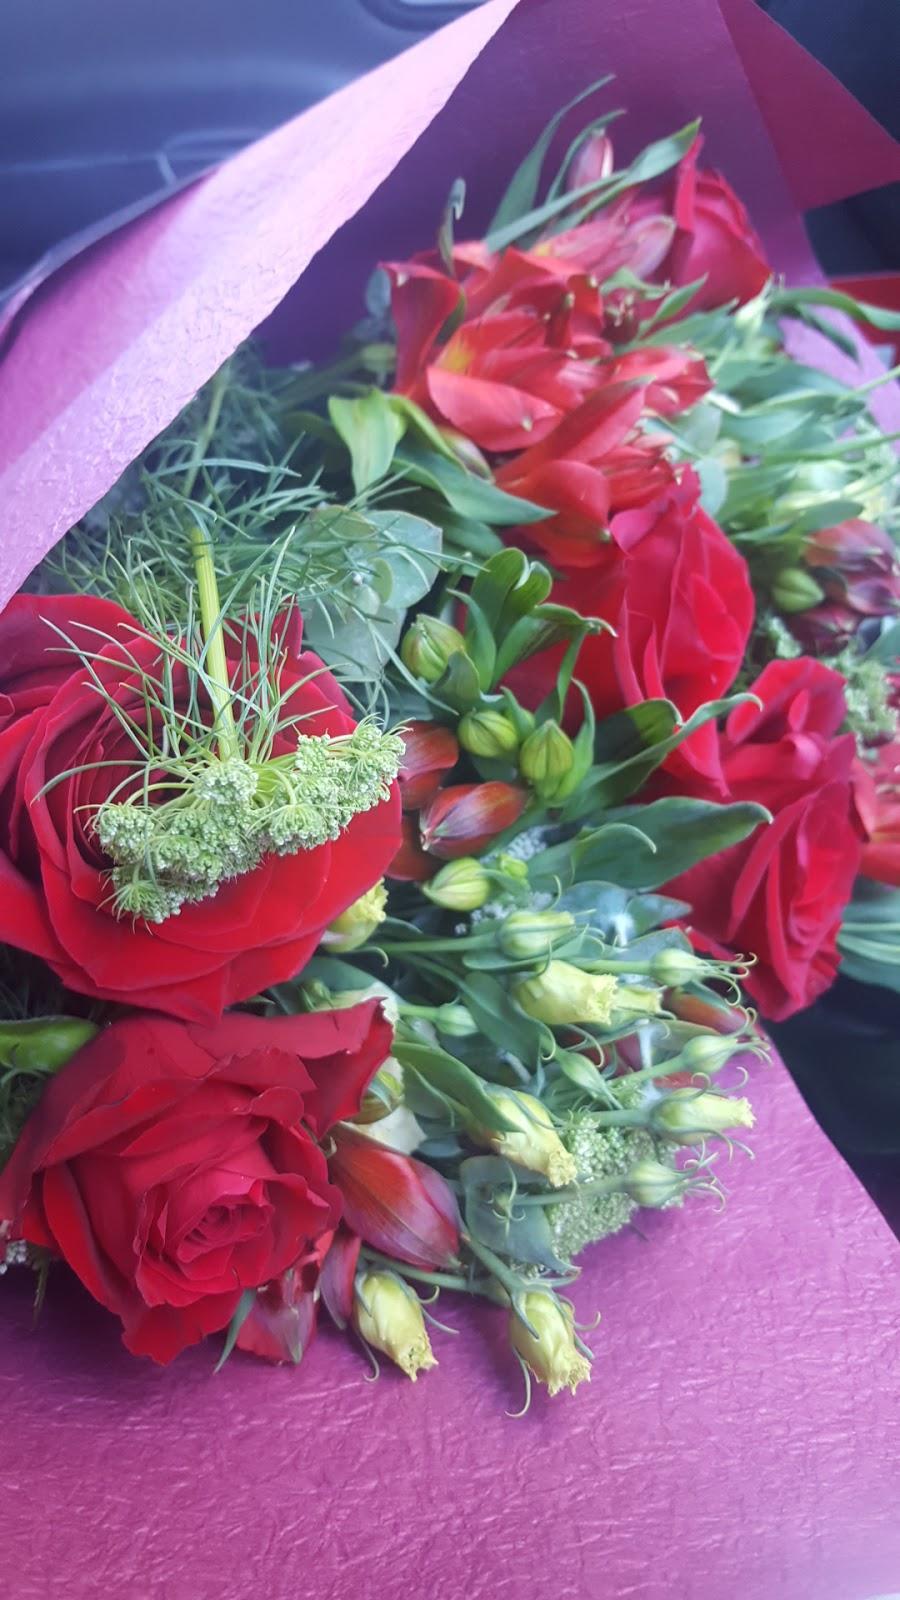 Stems Flower Market   florist   7 Mair St E, Ballarat Central VIC 3350, Australia   0353344284 OR +61 3 5334 4284